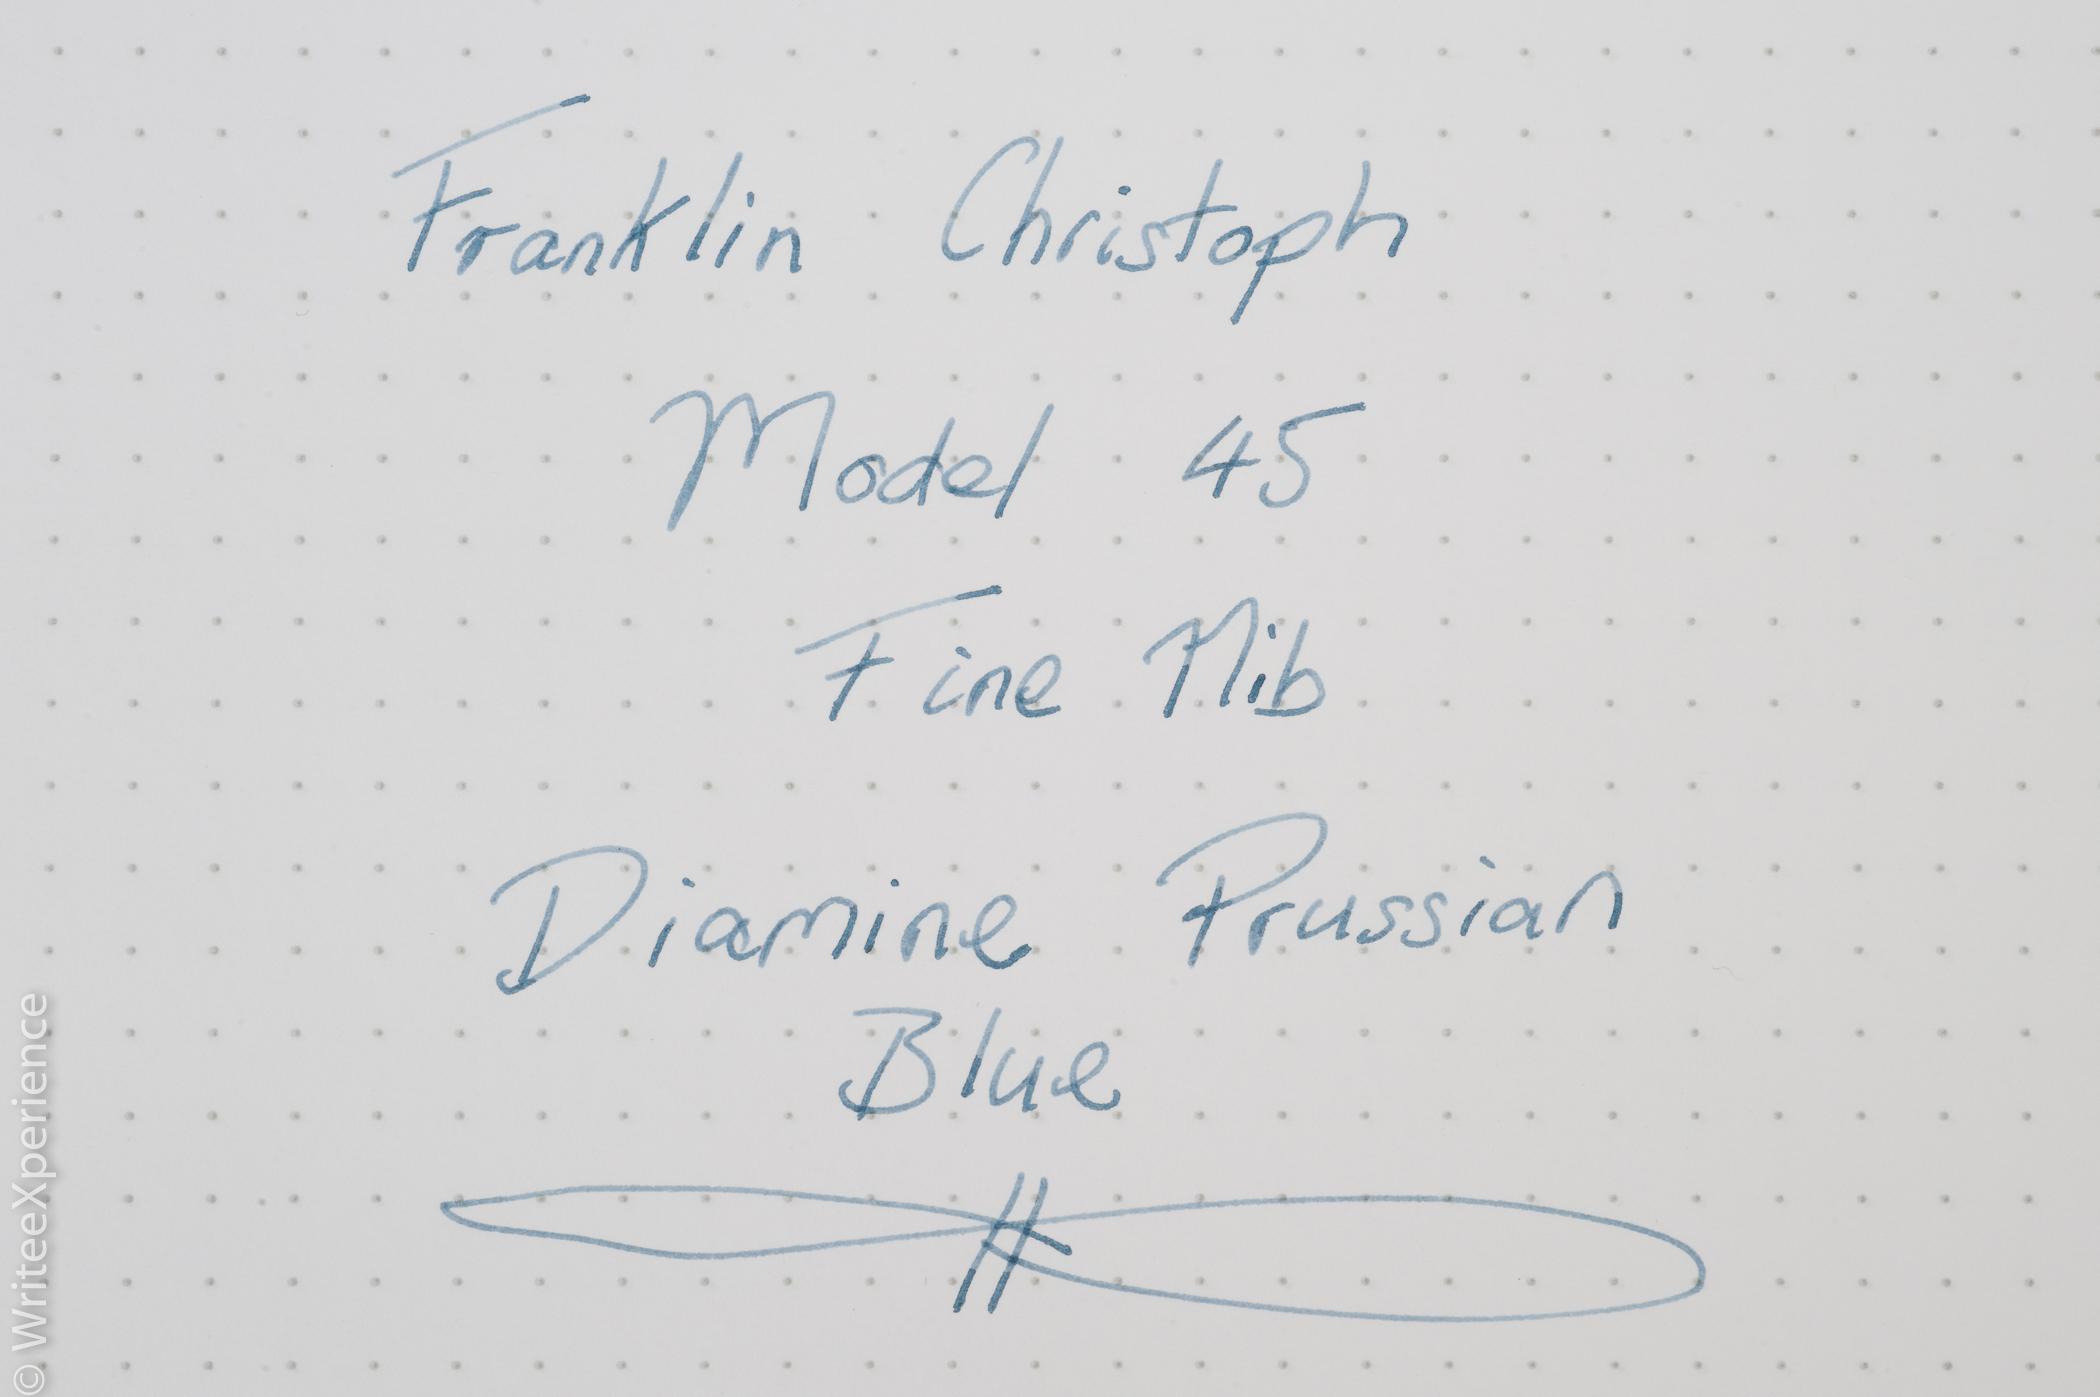 WriteeXperience-Franklin_Christoph_Model_45_ghost-12.jpg